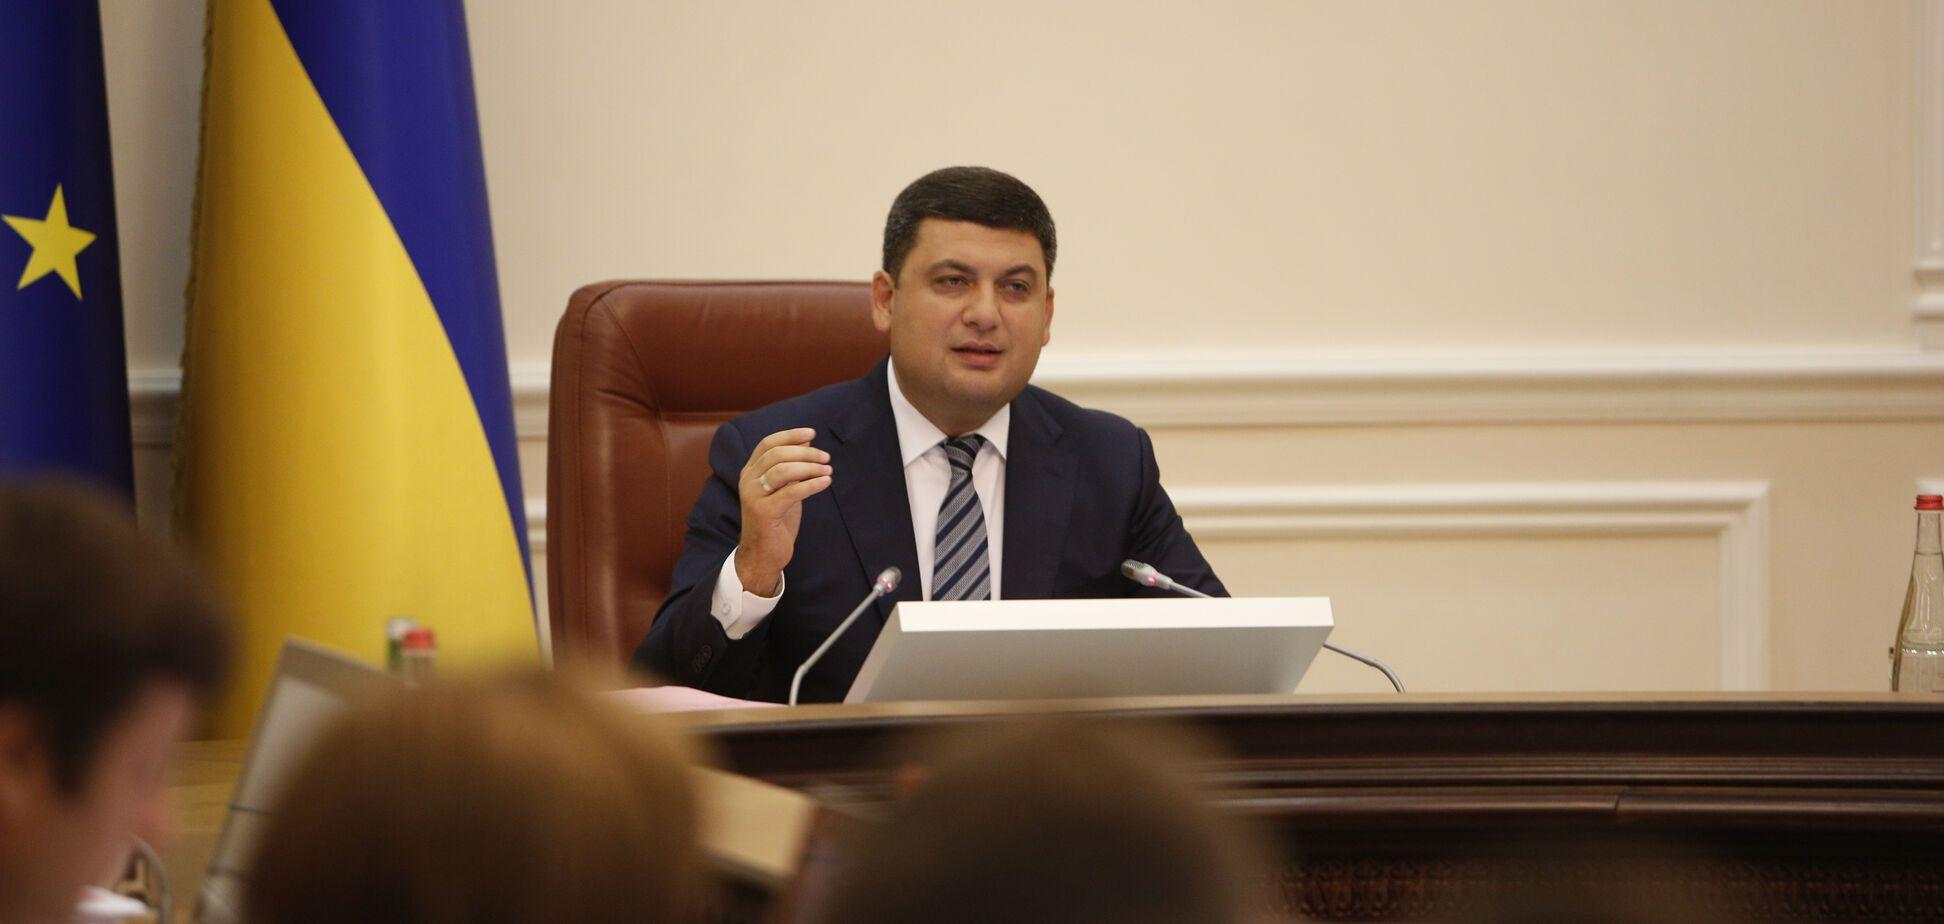 Украина без контрабанды: Гройсман представил план борьбы со схемами на таможне